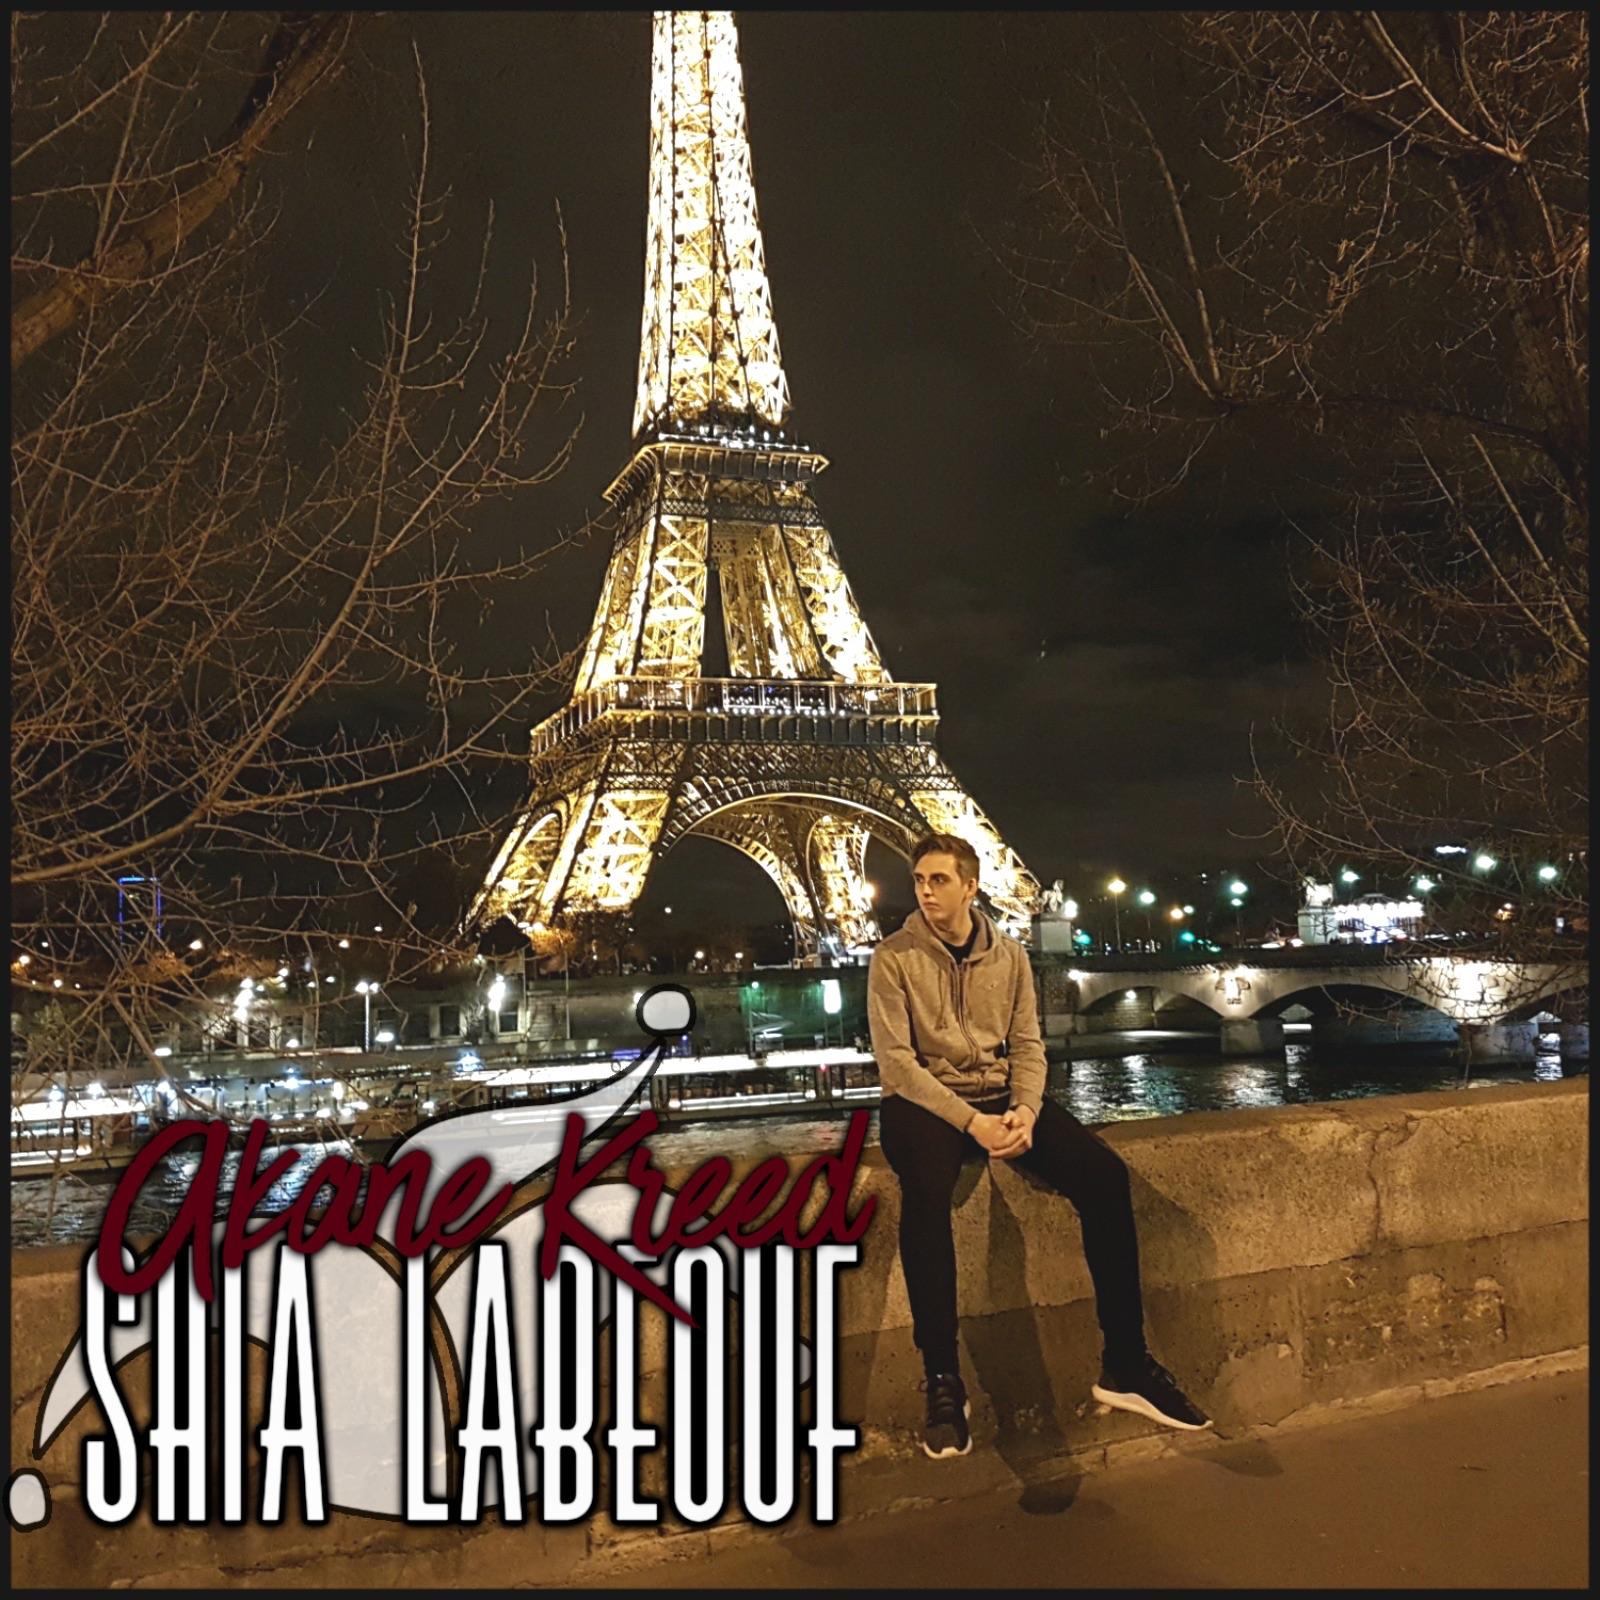 Shia LaBeouf - Single